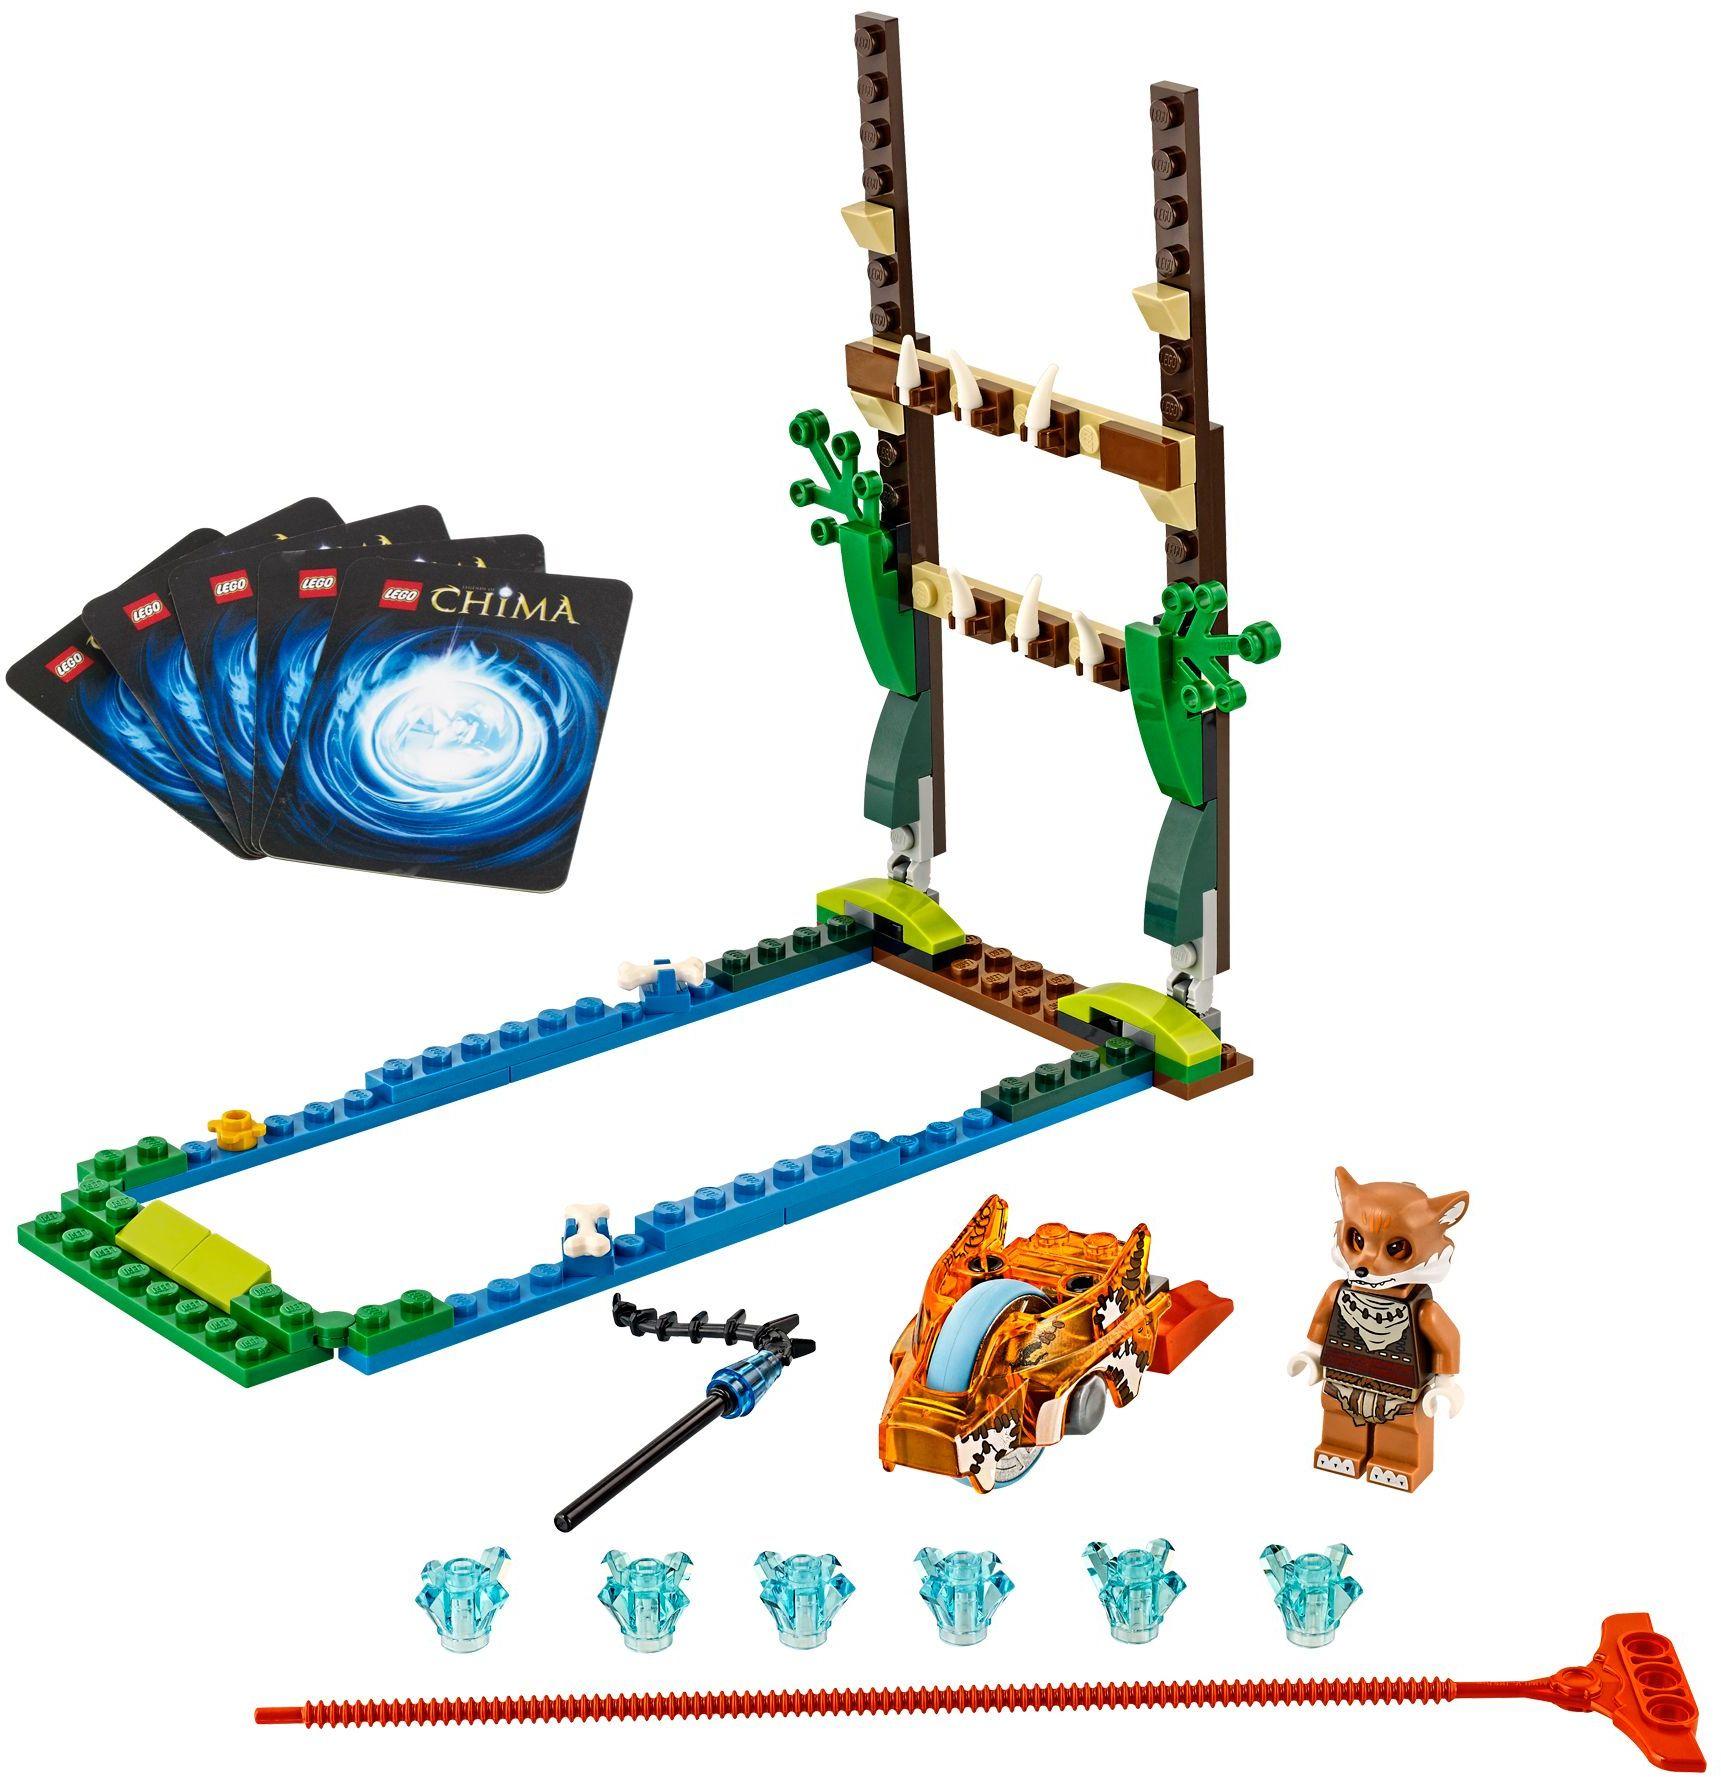 Lego Chima Speedorz coloring page  Free Printable